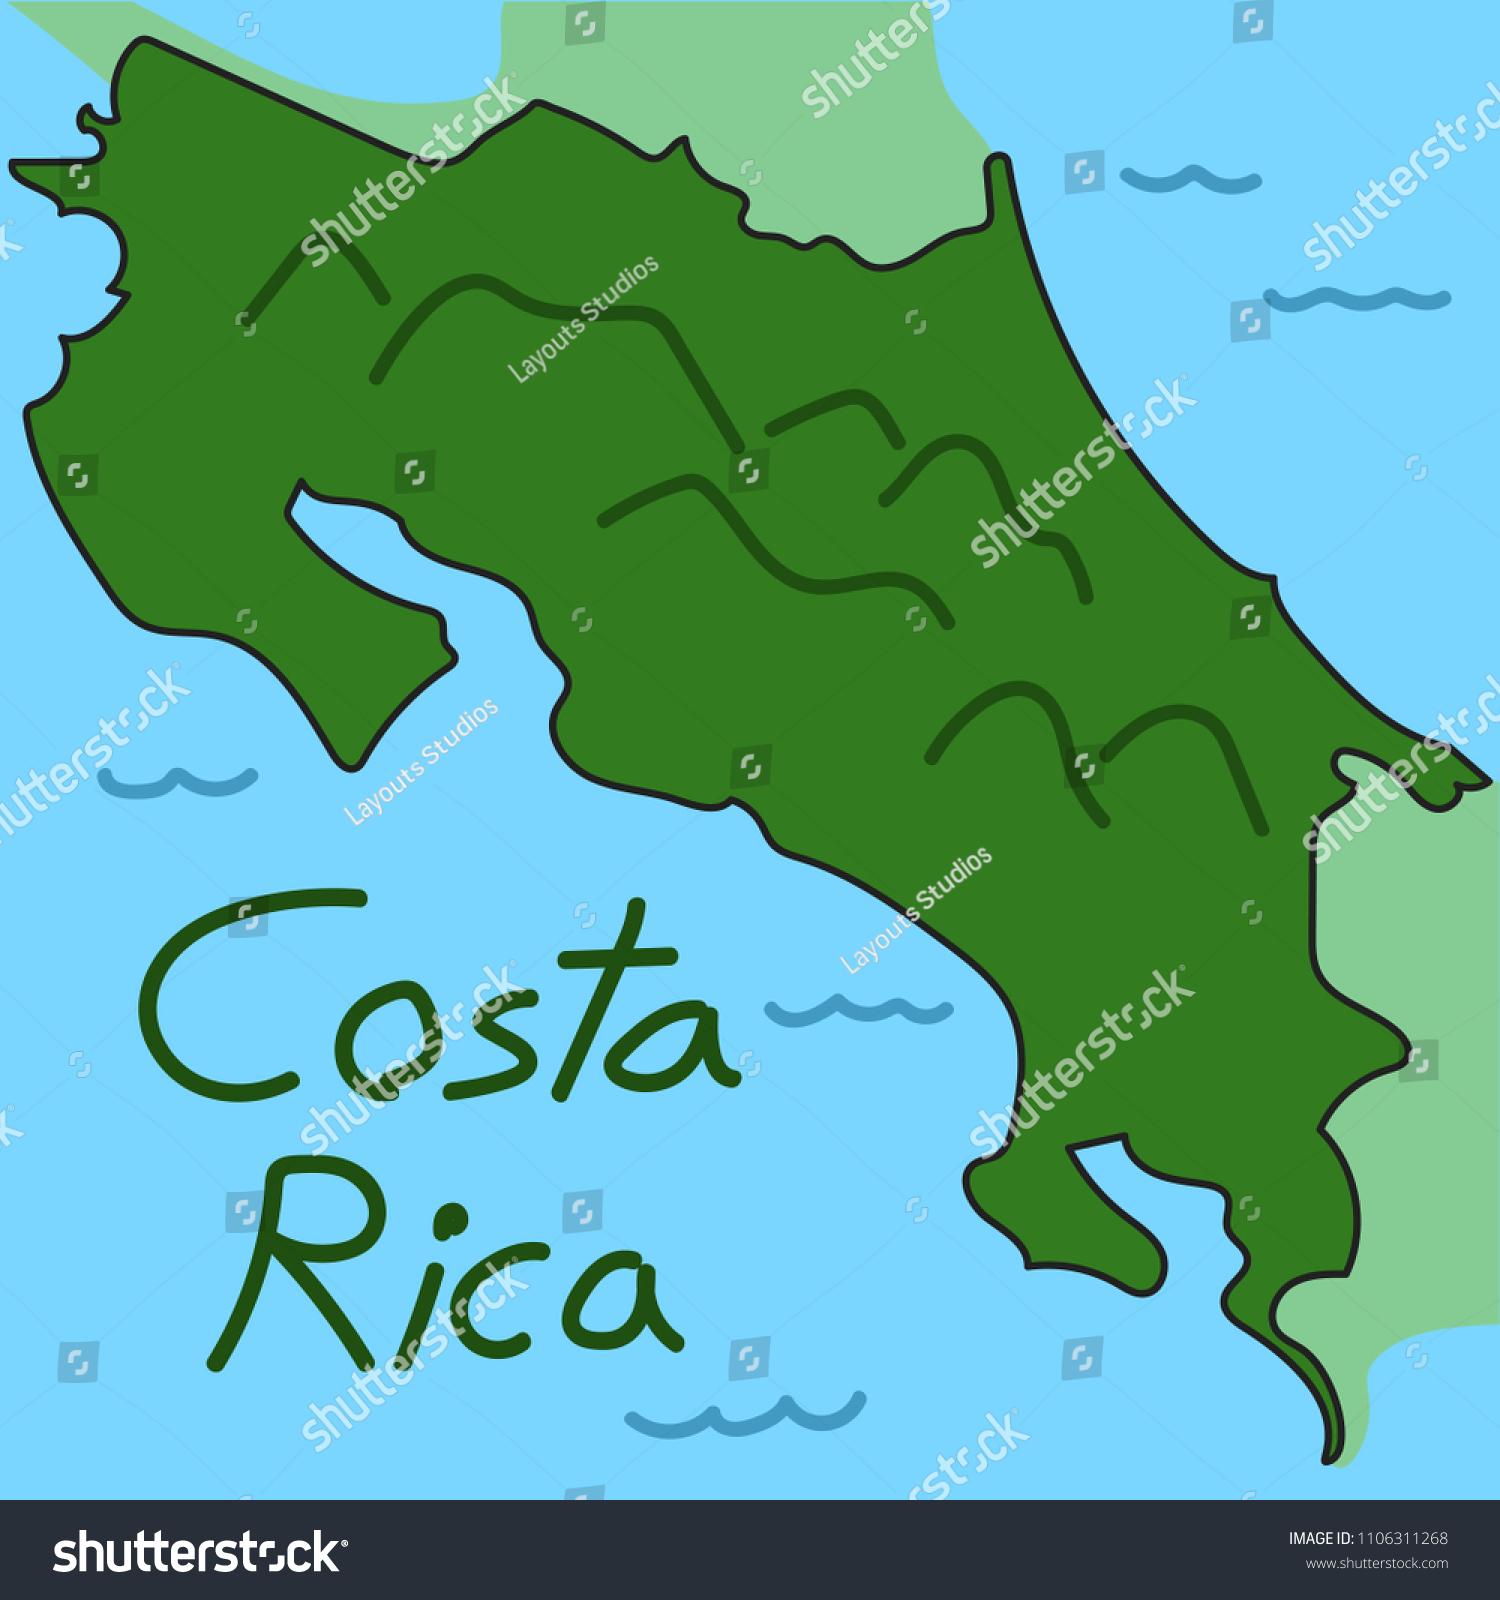 Vector De Stock Libre De Regalias Sobre Geographic Map Costa Rica1106311268